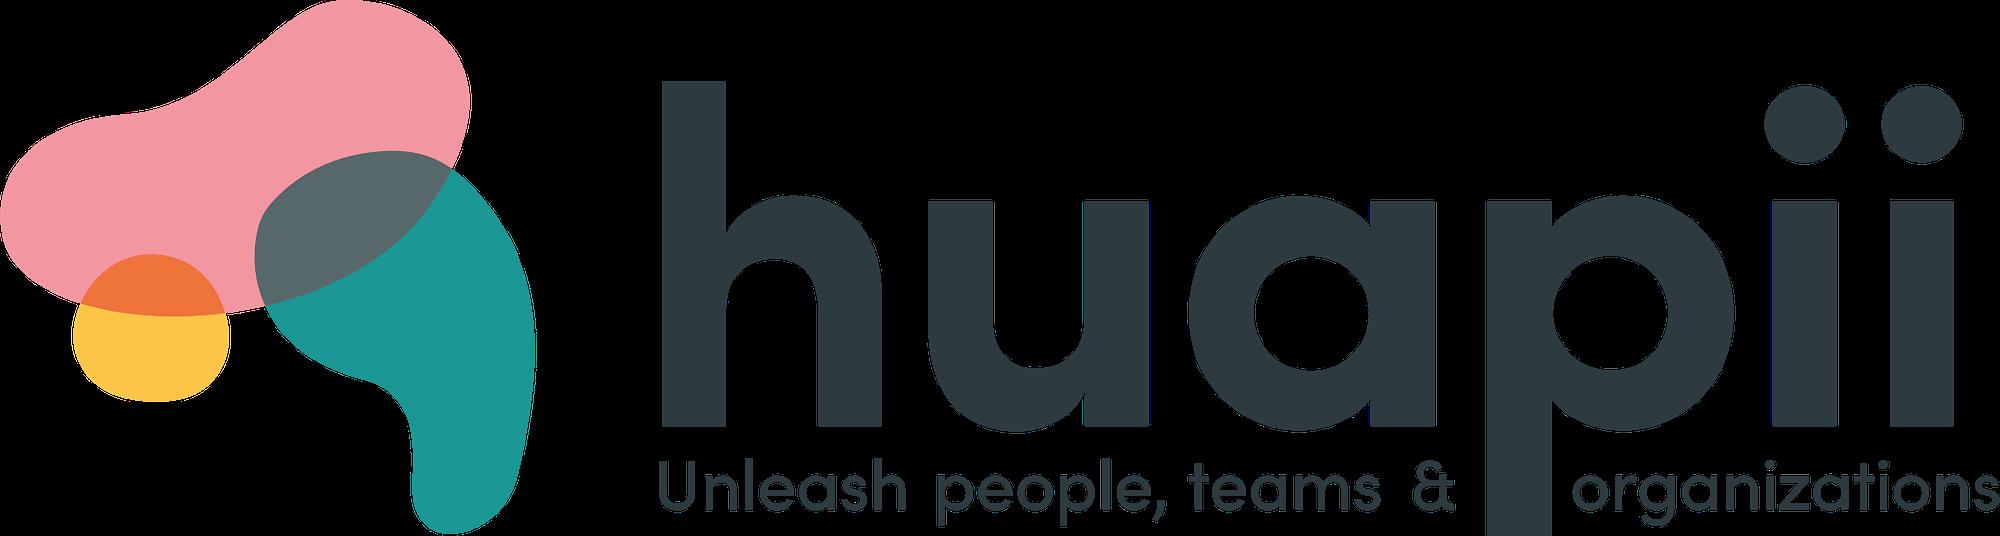 huapii logo